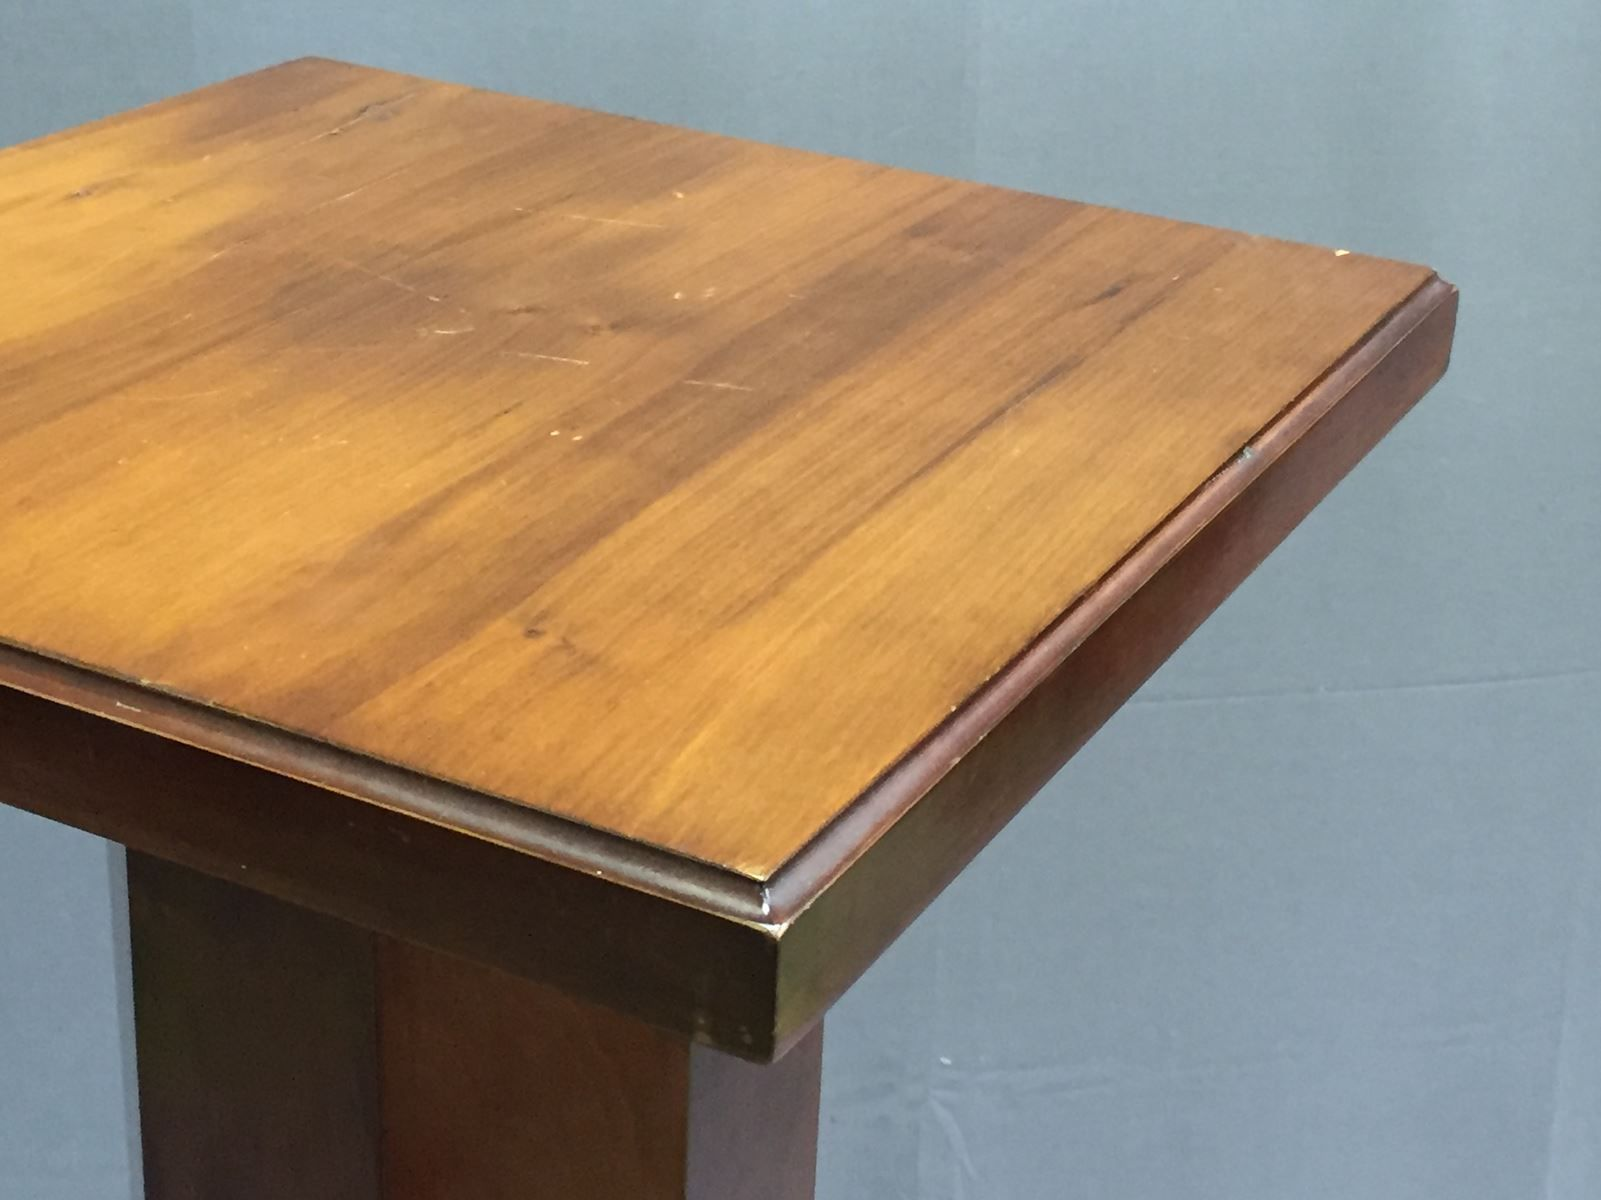 Mahogany art deco stool 1930s for sale at pamono for Meuble art deco 1930